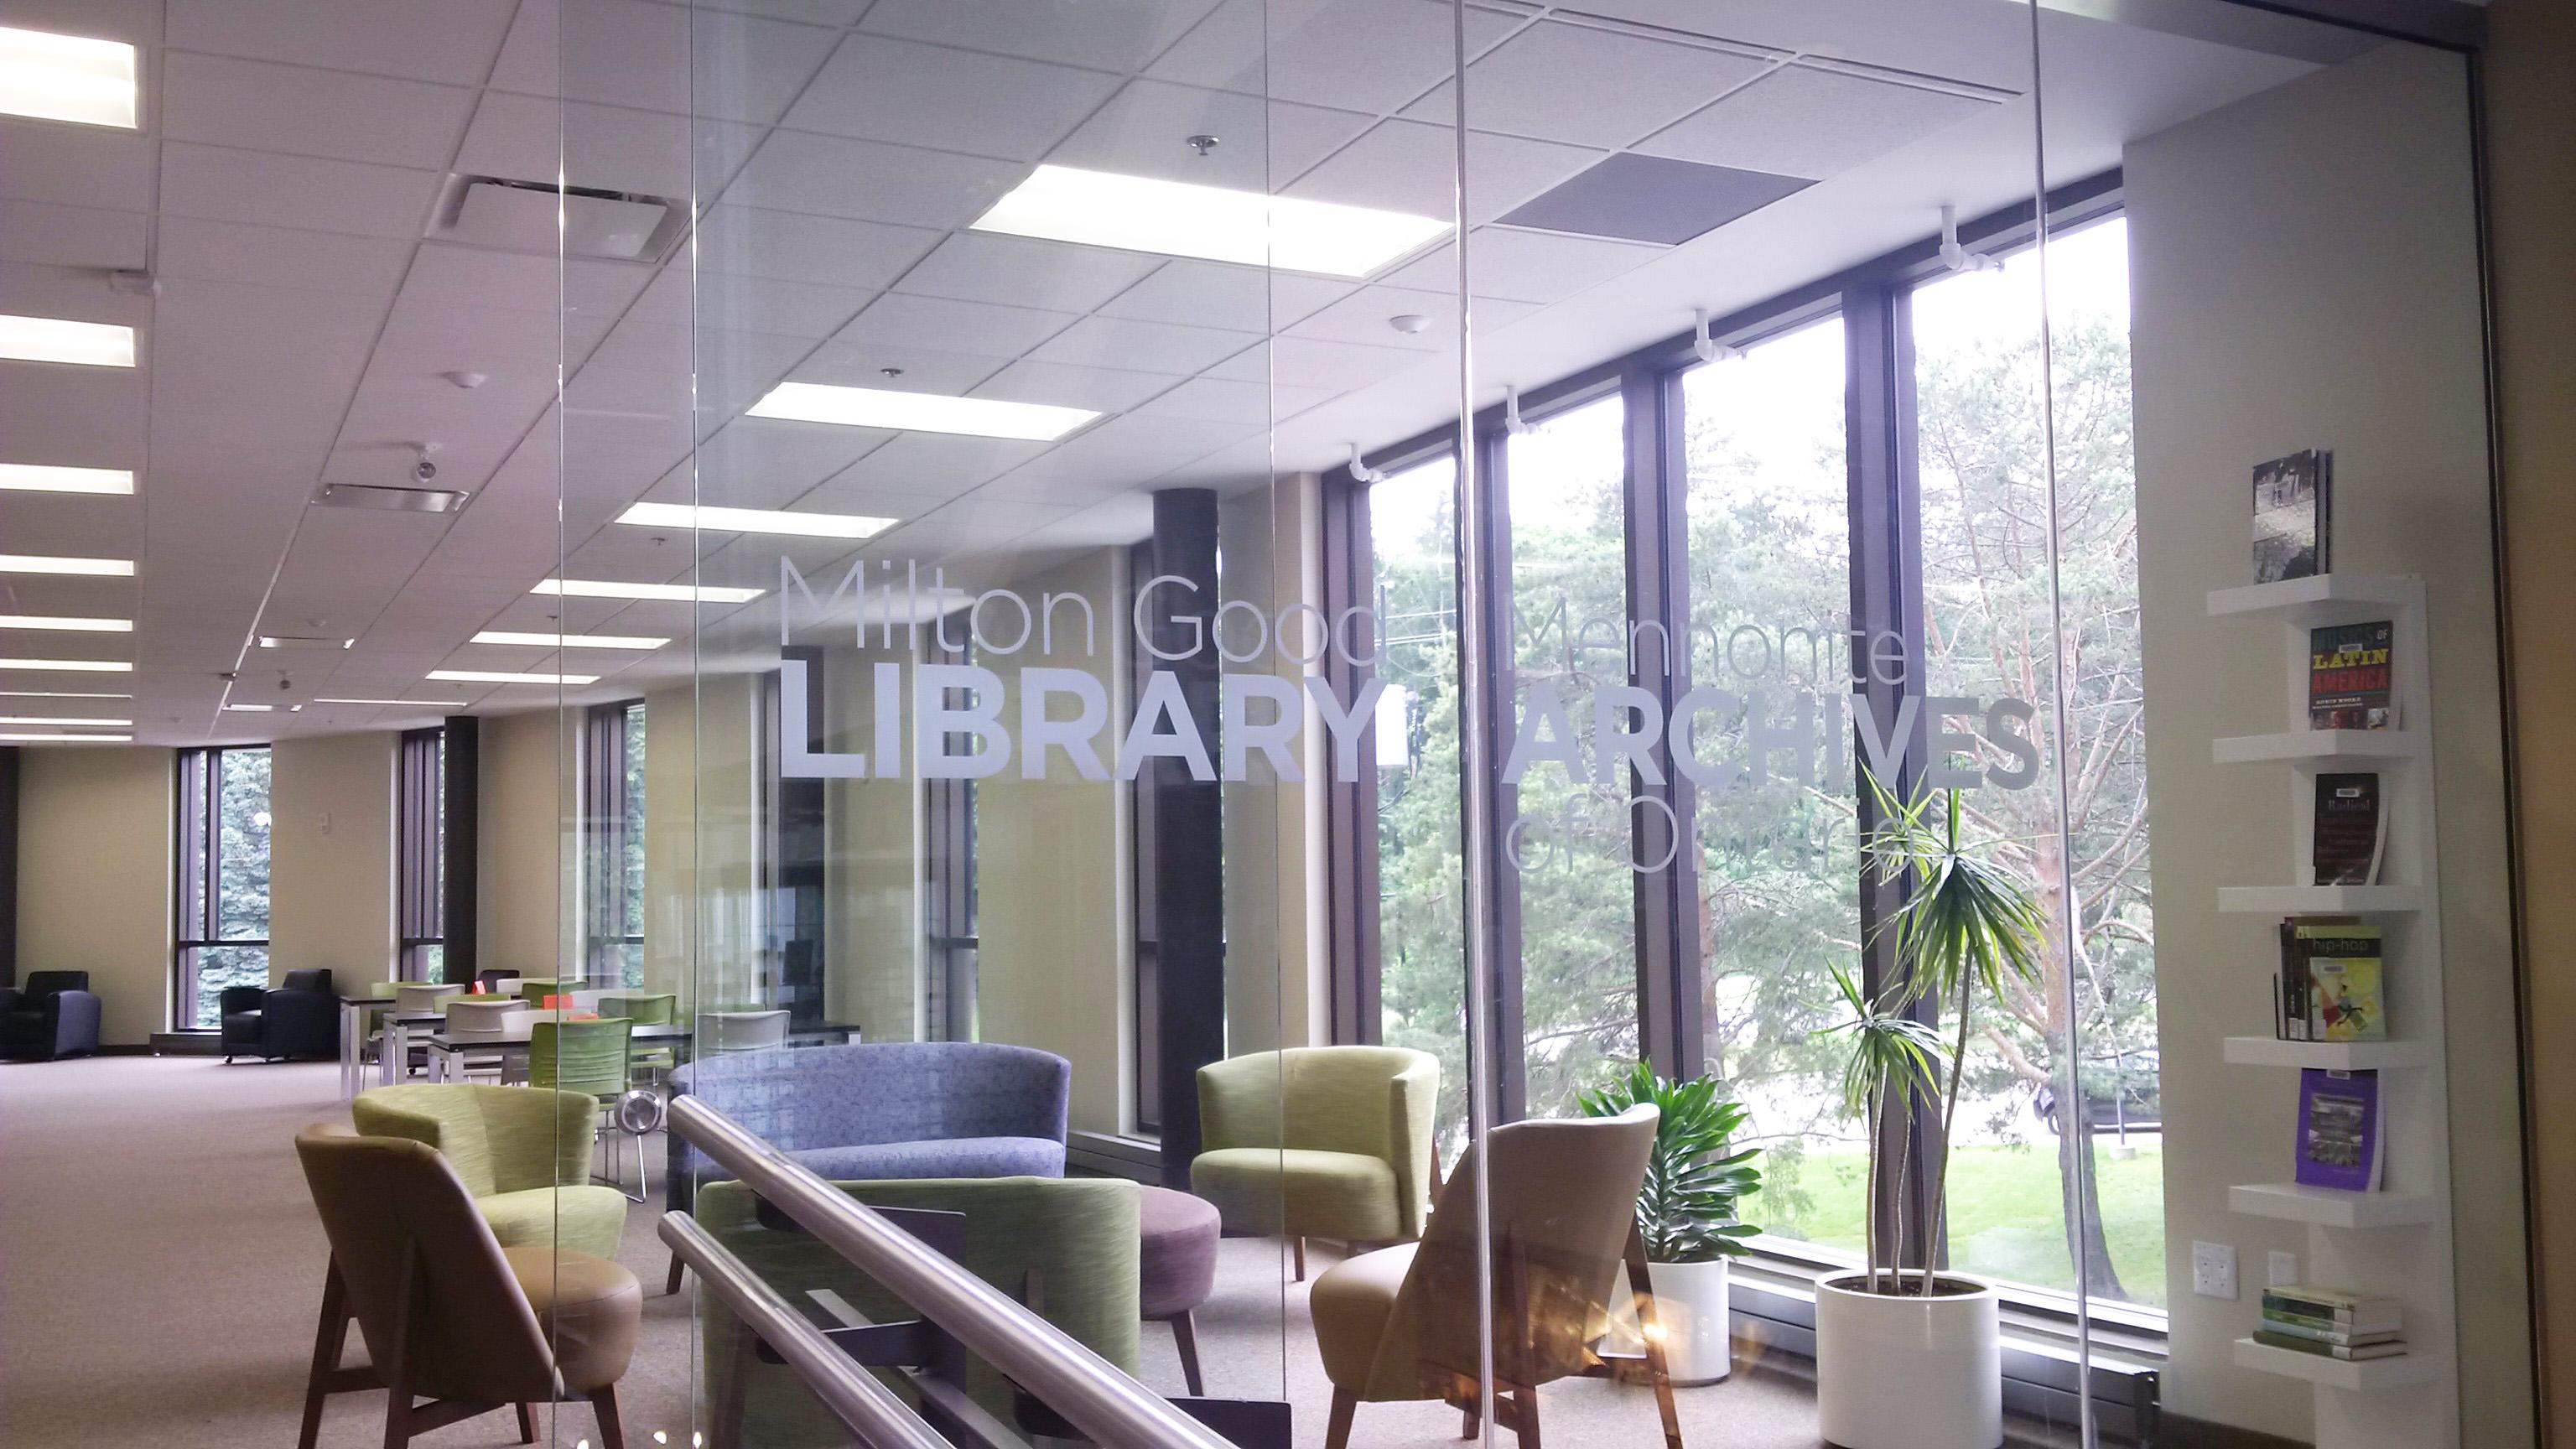 Entrance to the Milton Good Library